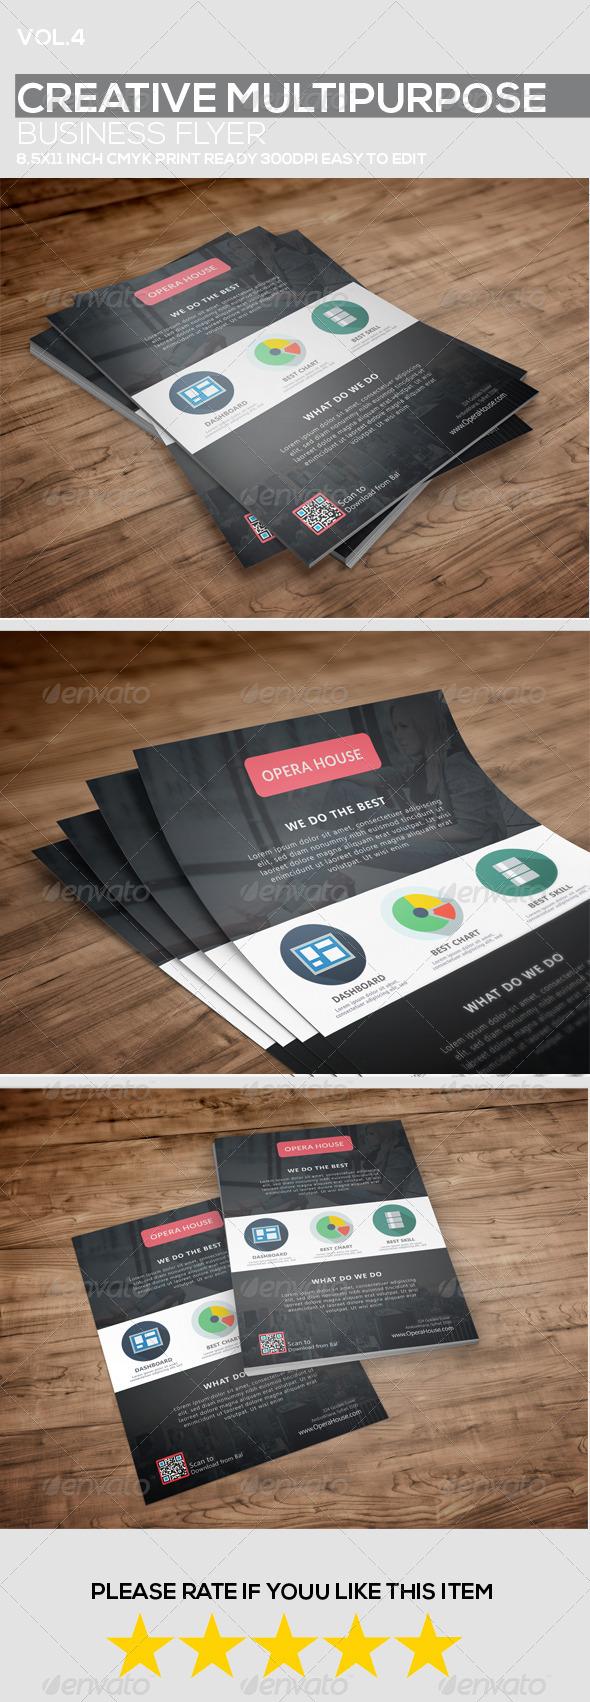 GraphicRiver Creative Multipurpose Business Flyer vol.4 8772171